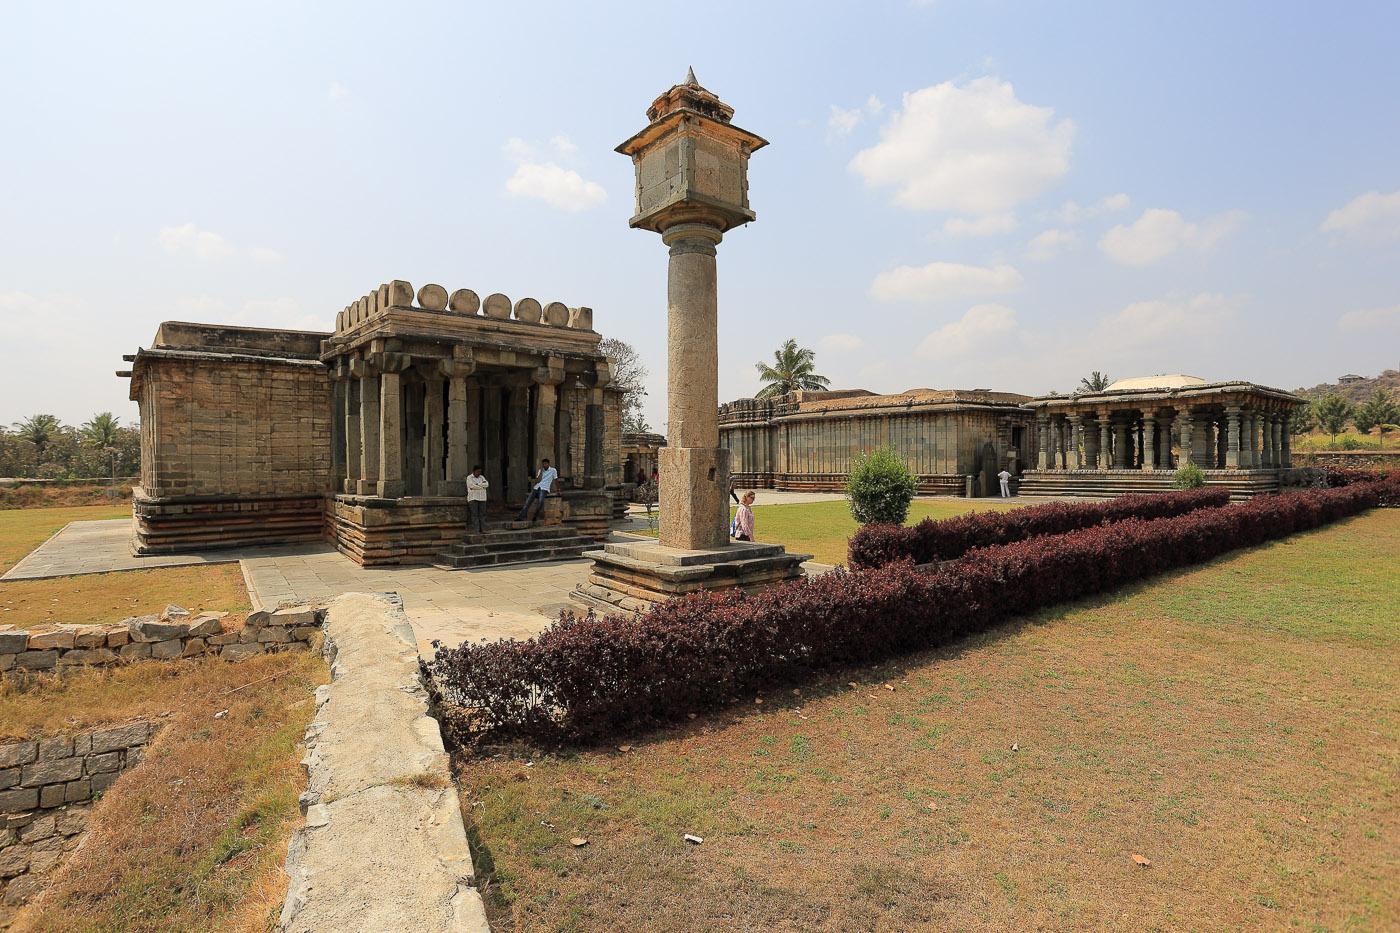 Фотография №11. Halebeedu Basadi Digambar Jain Temples. (Canon 17-40, 1/200, 0 eV, f 6.3, 17mm, ISO 100).